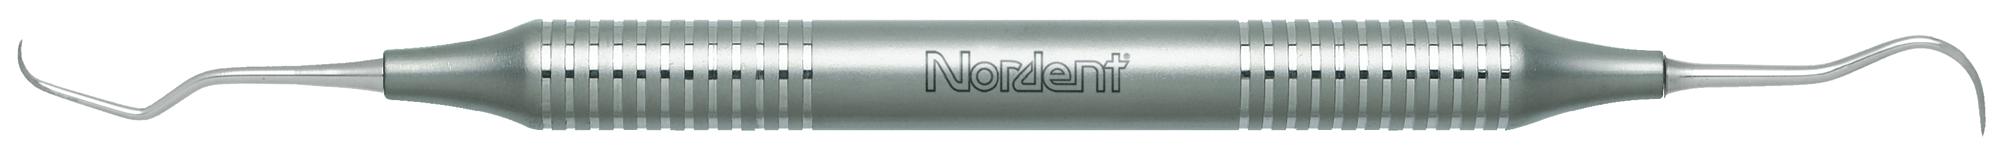 Anterior Scalette N137M (Mini Blade)